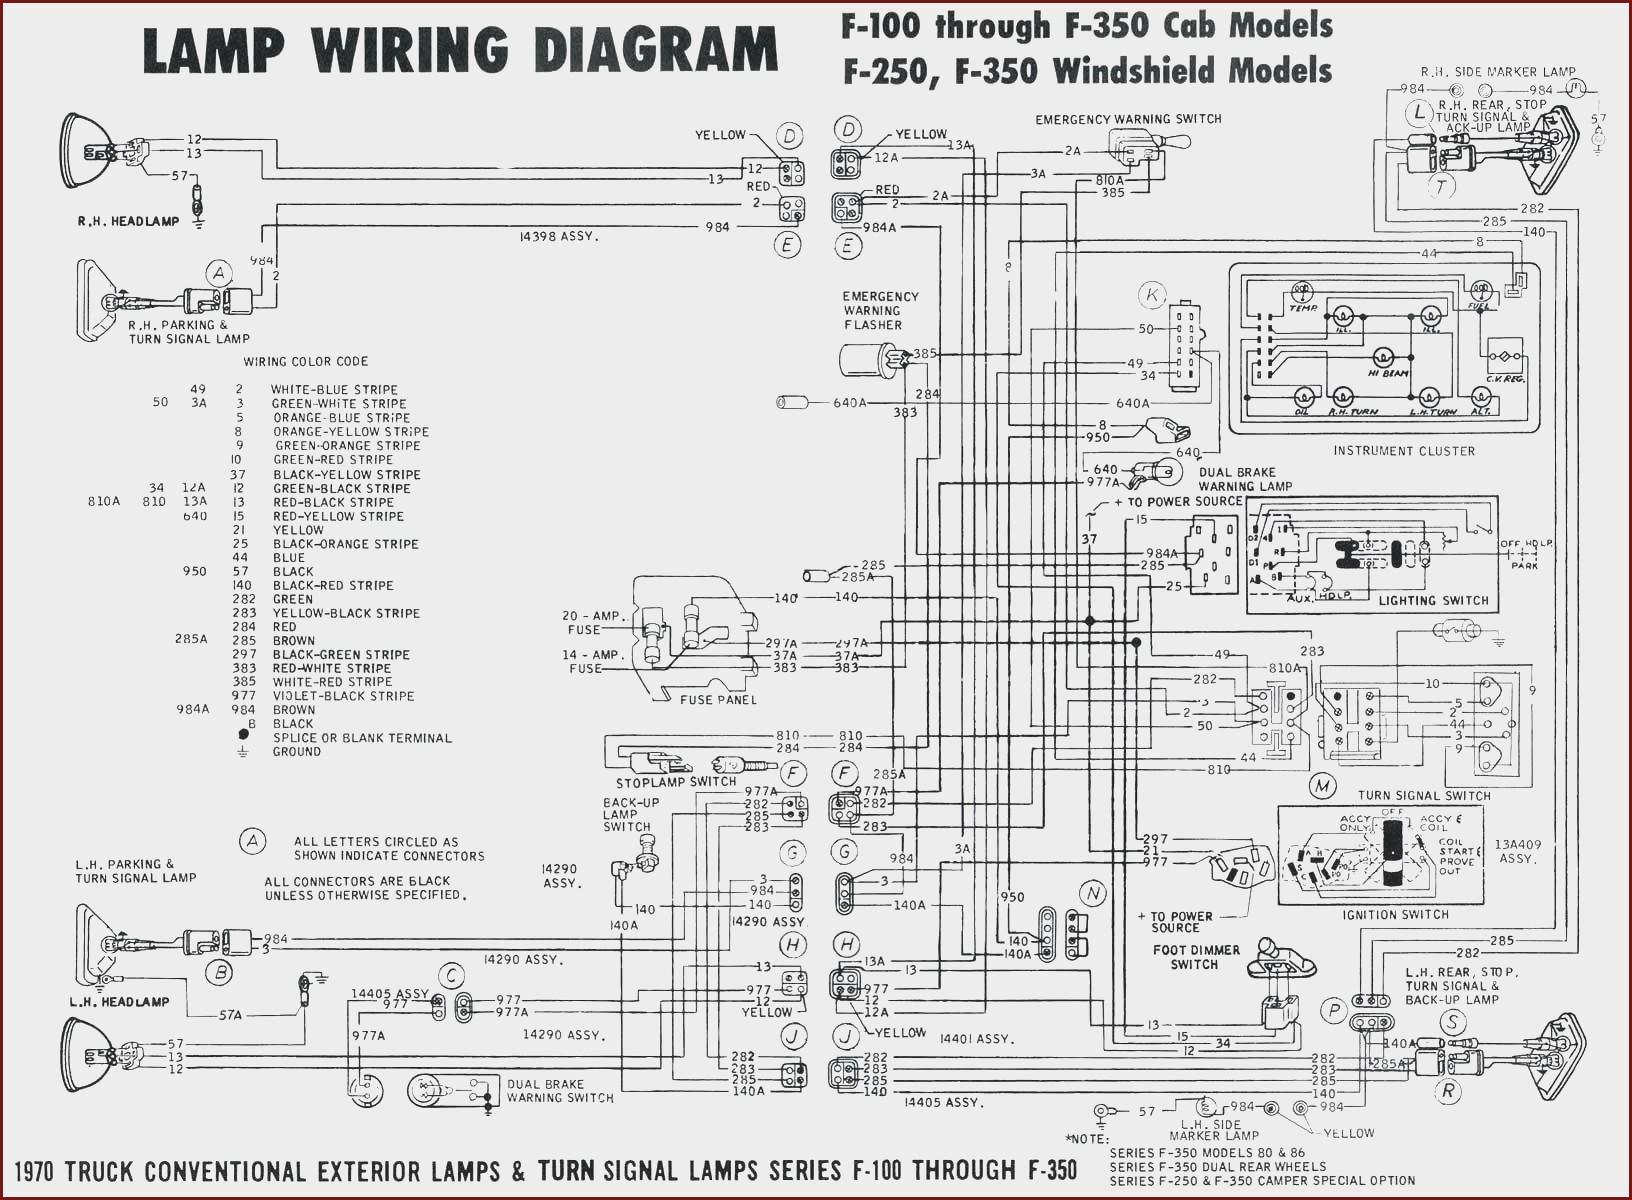 2006 Jeep Liberty Wiring Diagram 2006 Jeep Wrangler Ac Wiring Diagram 2005 Jeep Grand Of 2006 Jeep Liberty Wiring Diagram